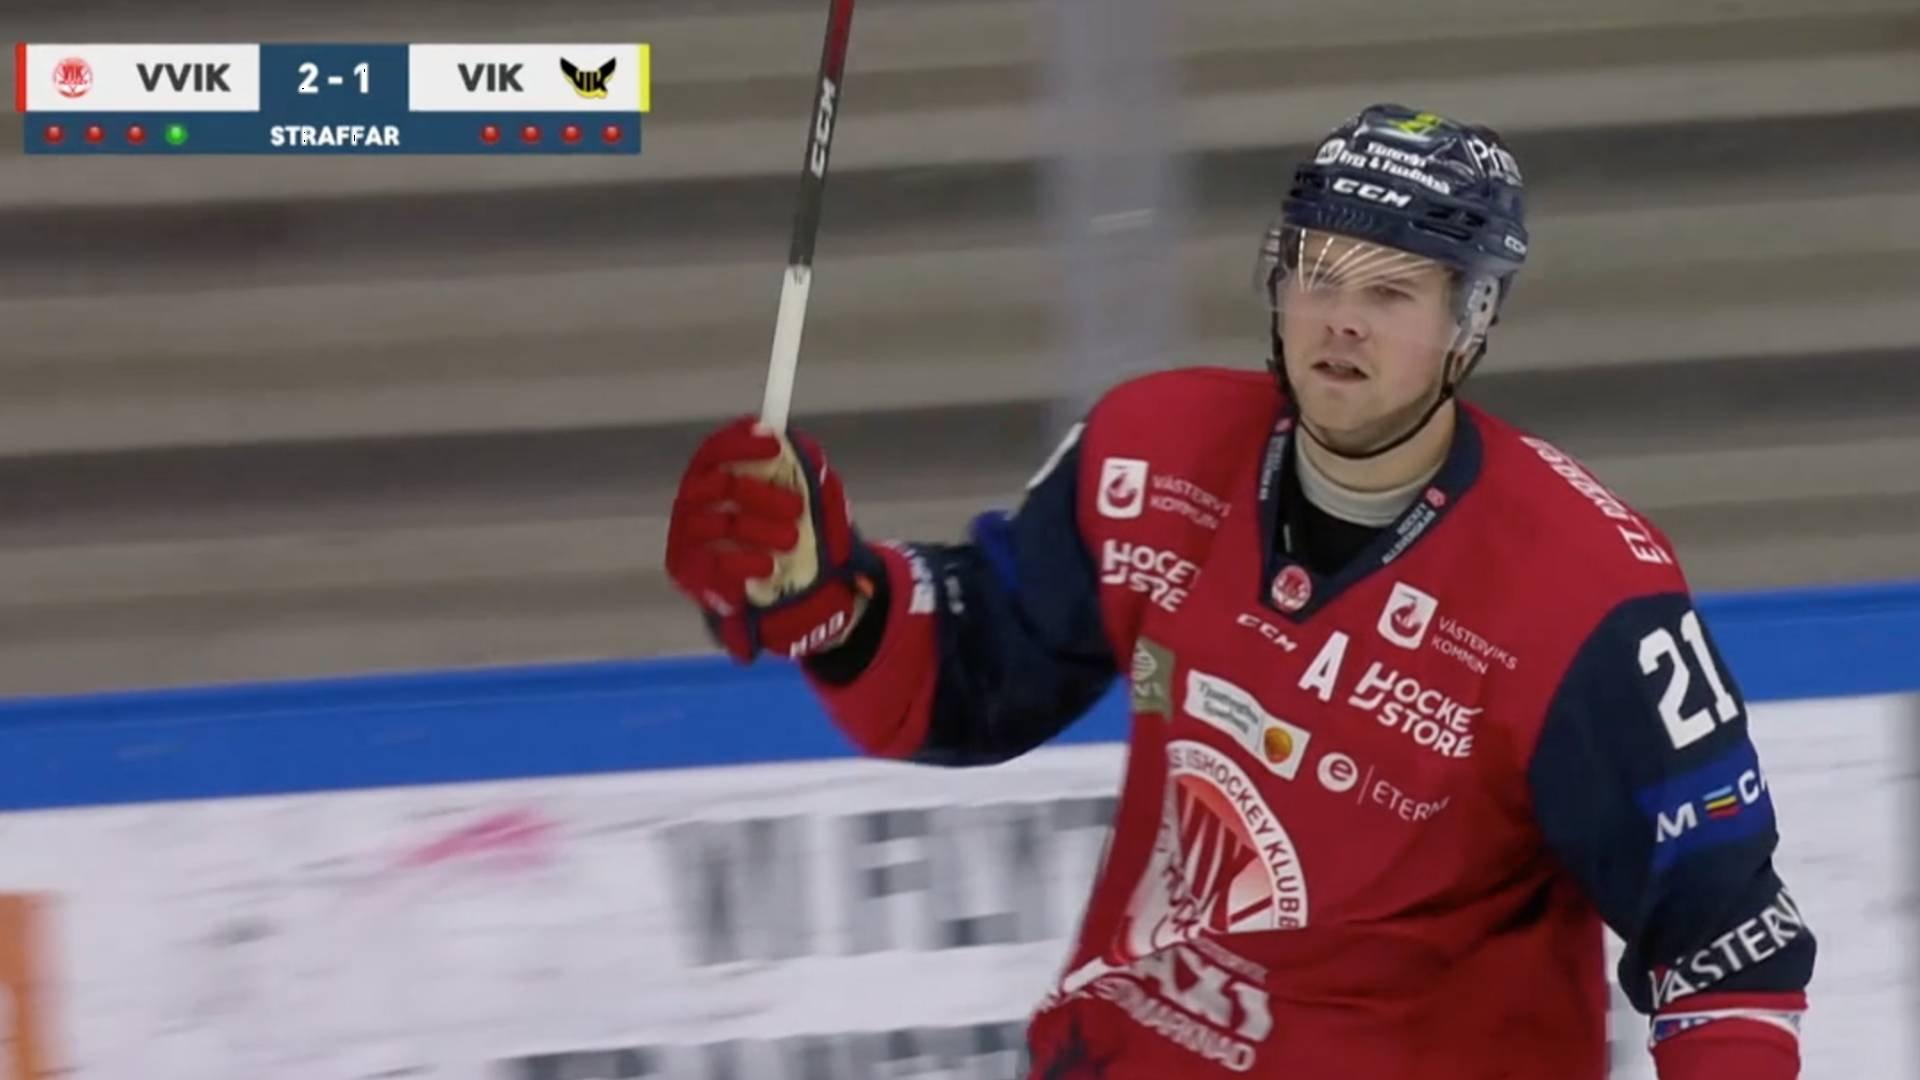 Highlights VIK - Västerås